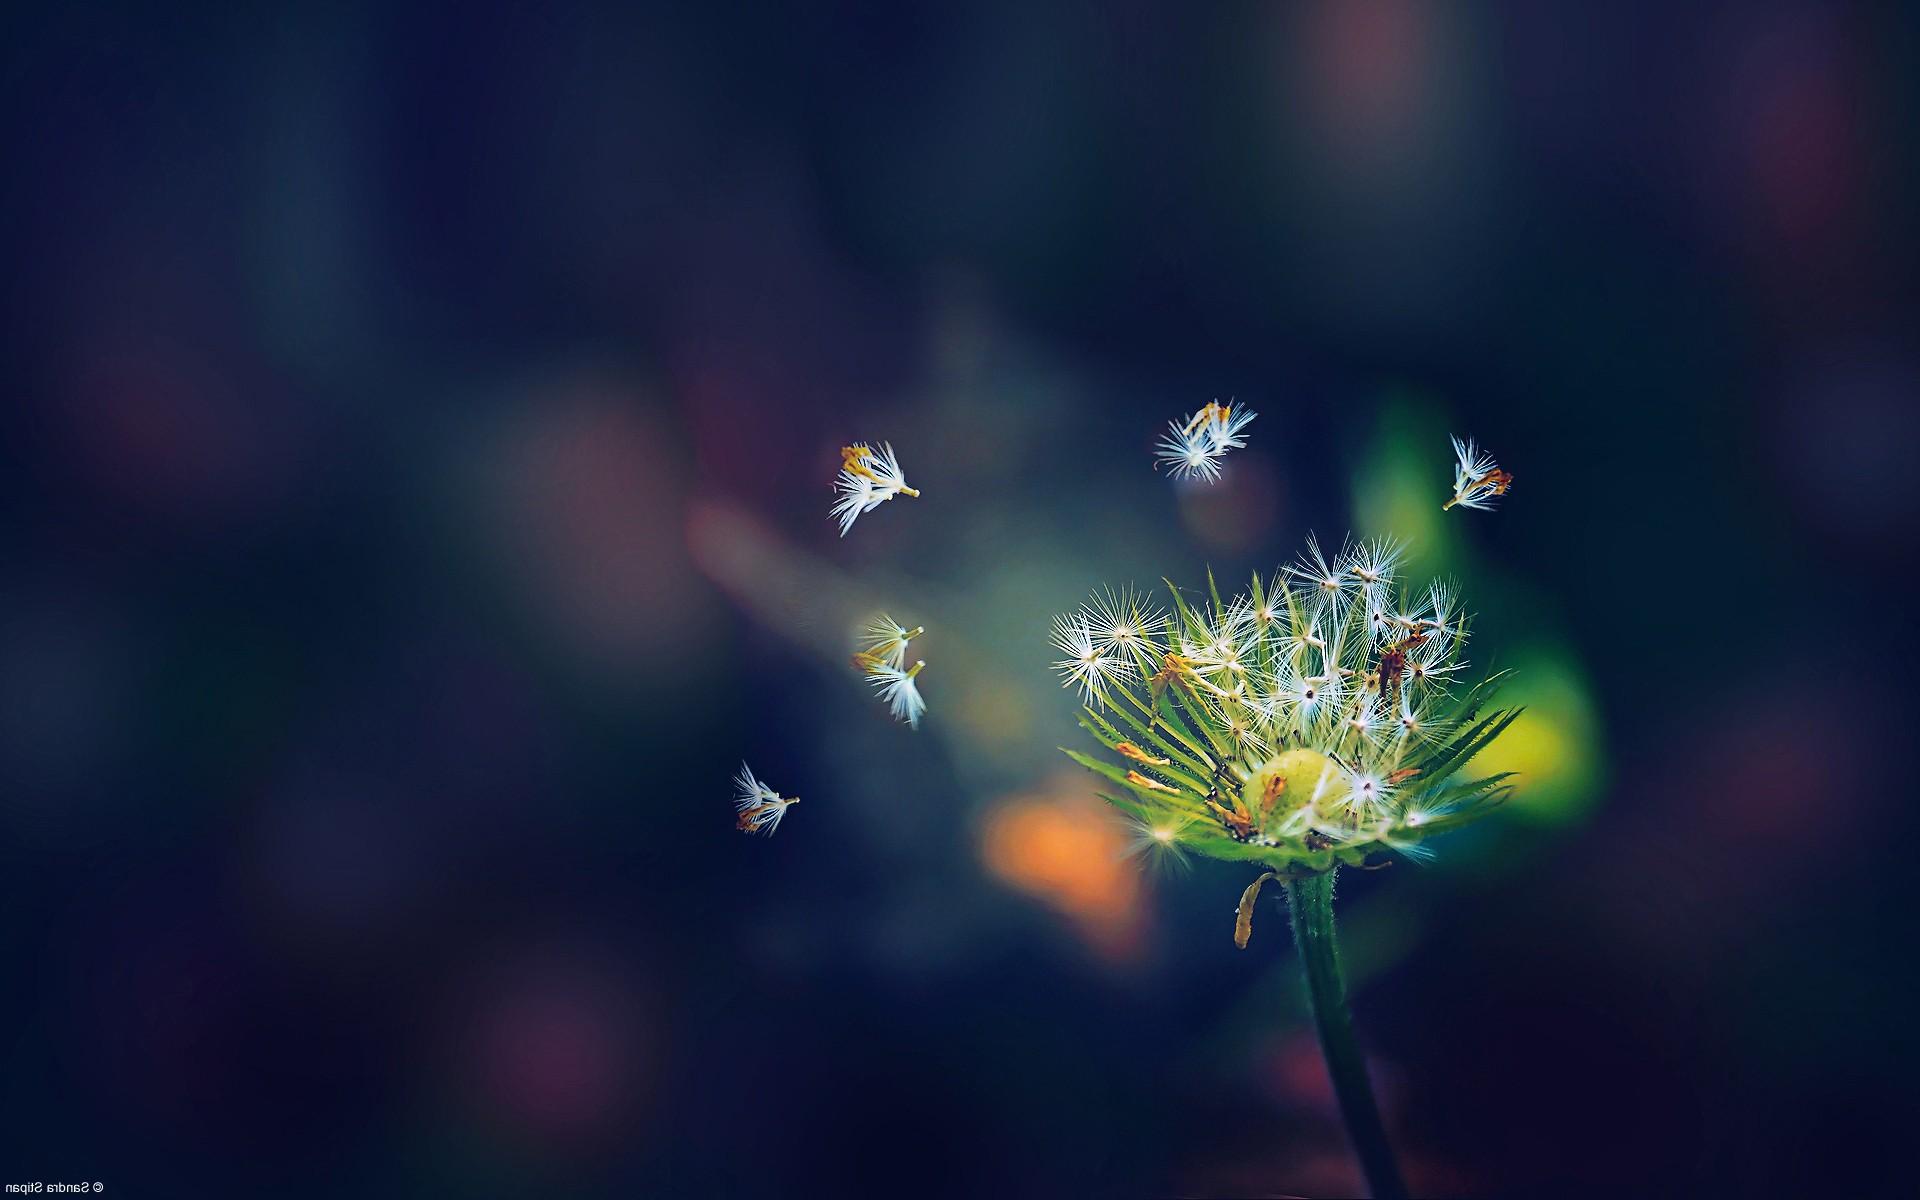 High Resolution 1080p Flower Wallpaper Hd Gambar Bunga